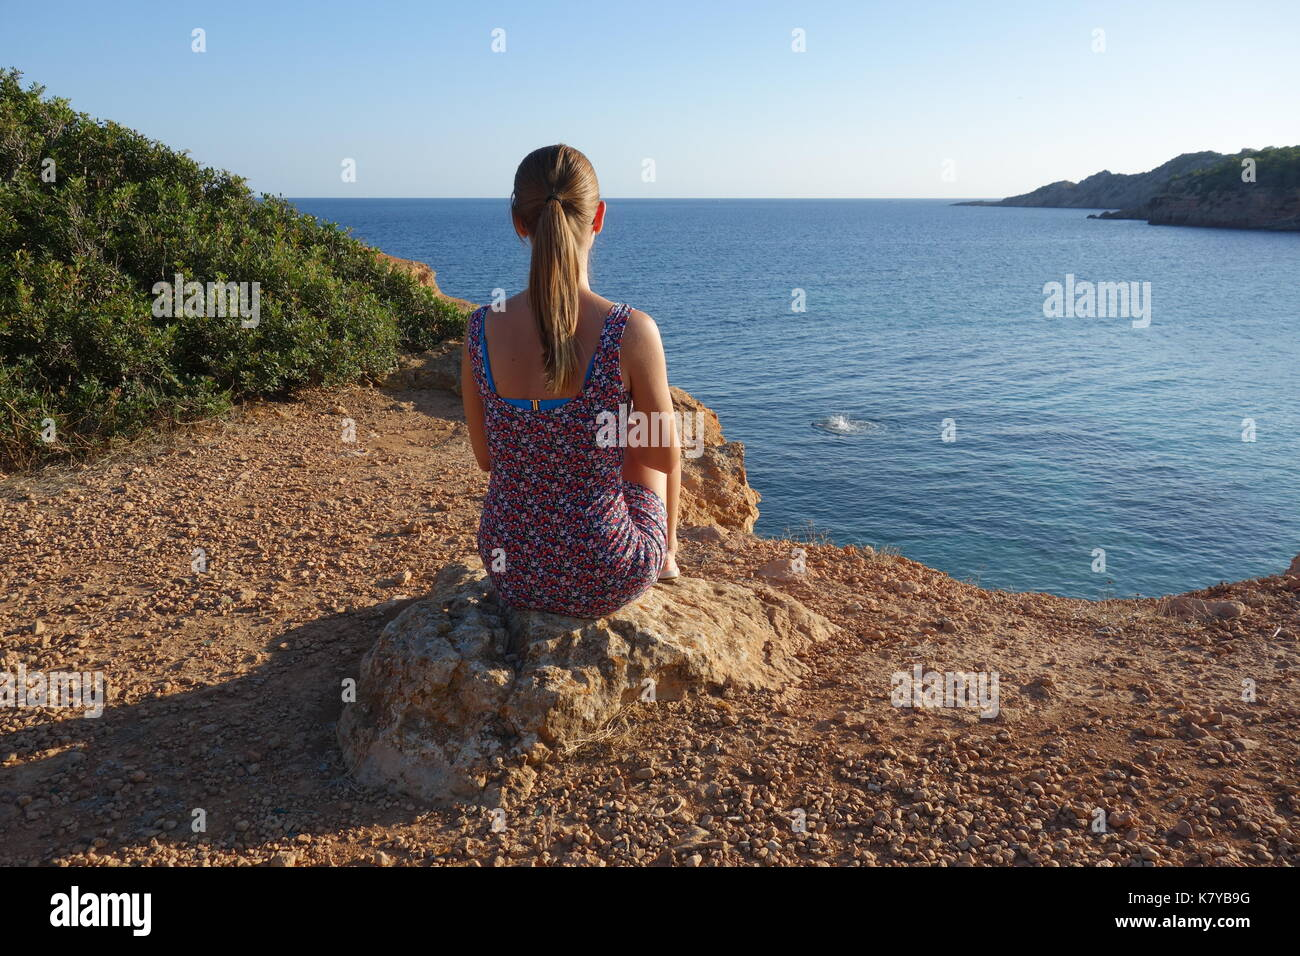 Blonde girl looking towards the beach of Cala sa Caleta or Bol Nou, Spain - Stock Image